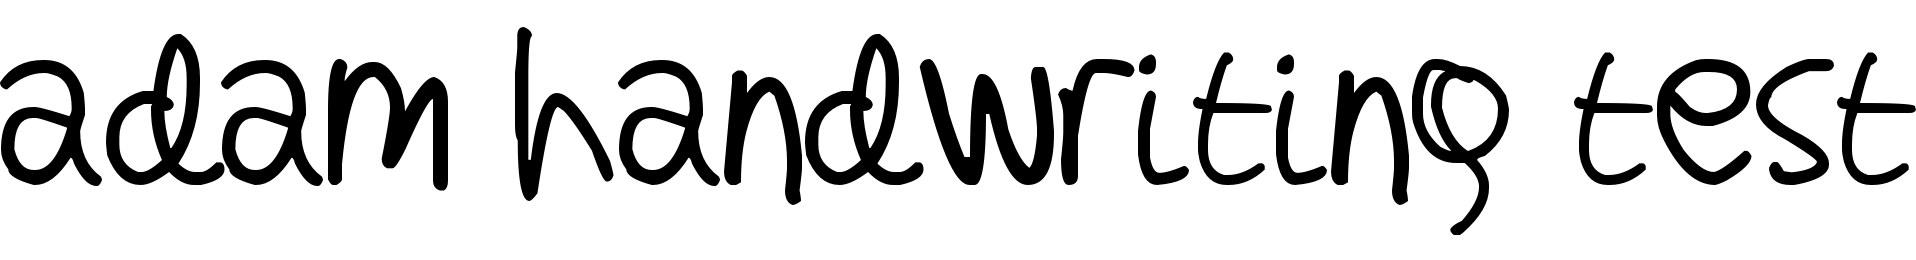 adam handwriting test